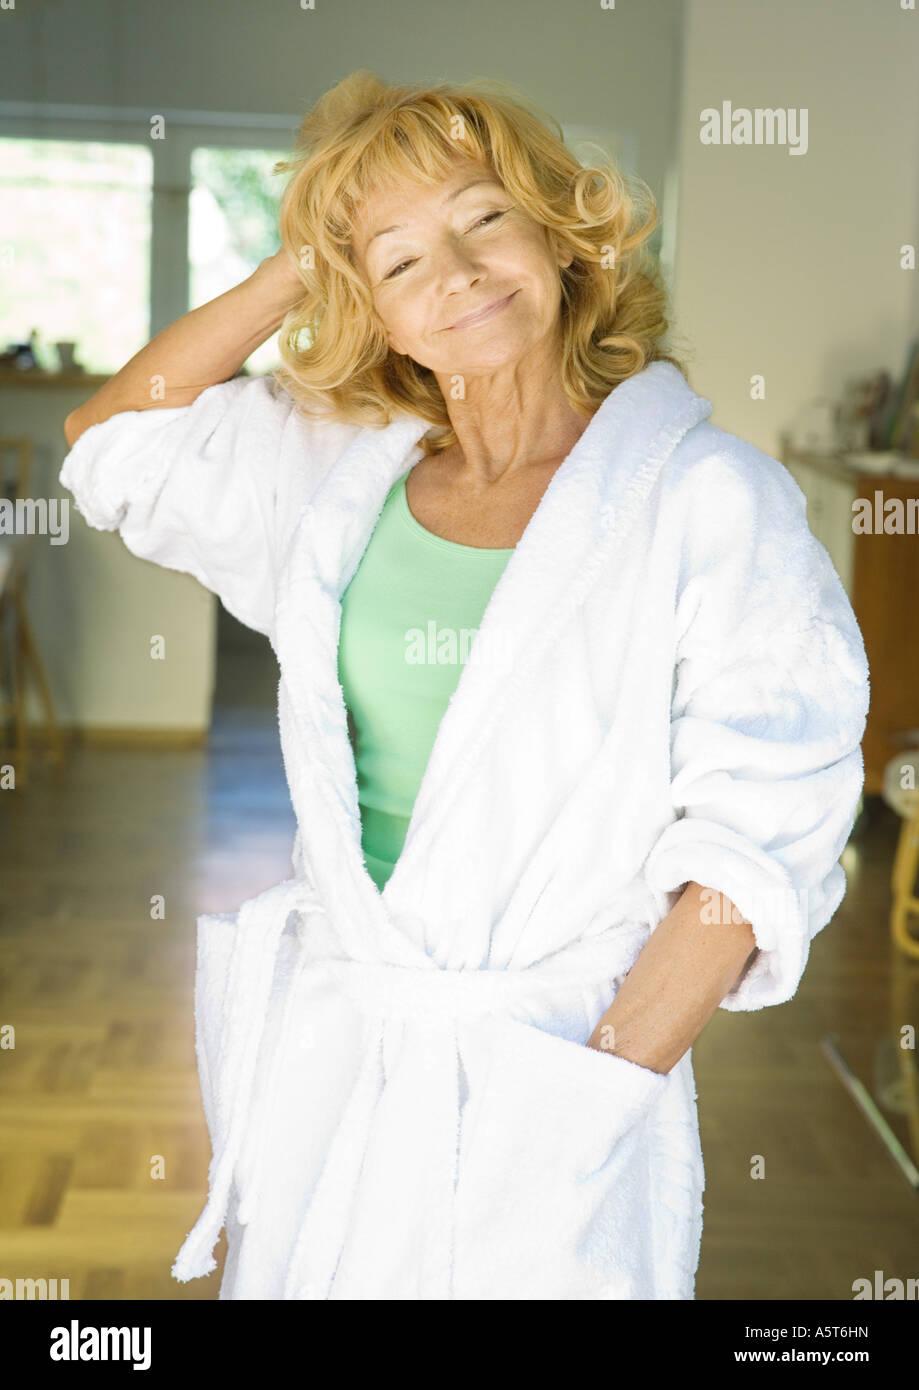 Senior woman standing in bathrobe - Stock Image